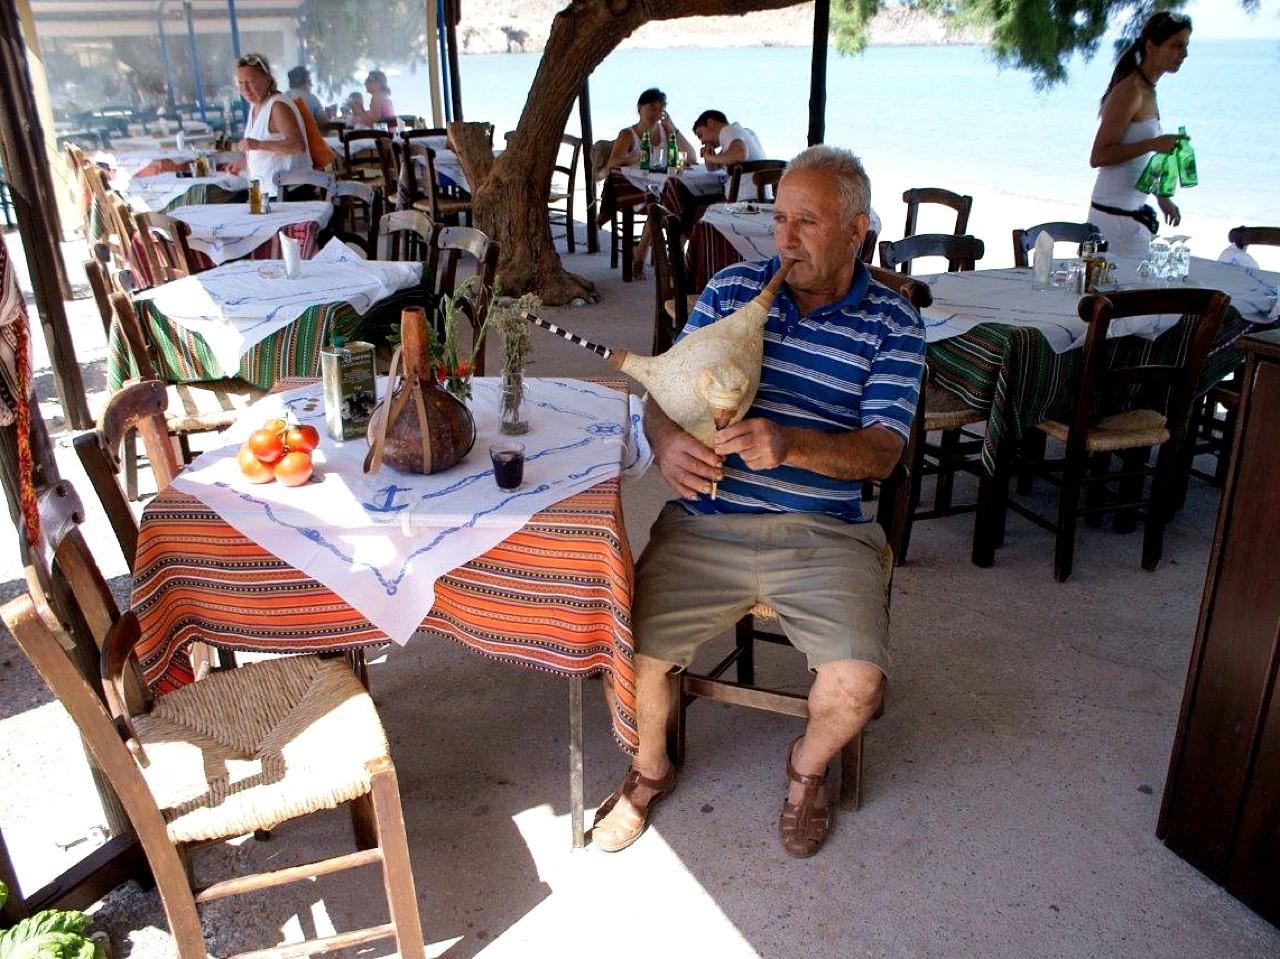 platanakis restaurant kato zakros, platanakis tavern kato zakros, eatery kato zakros, where to eat kato zakros, best food kato zakros east crete